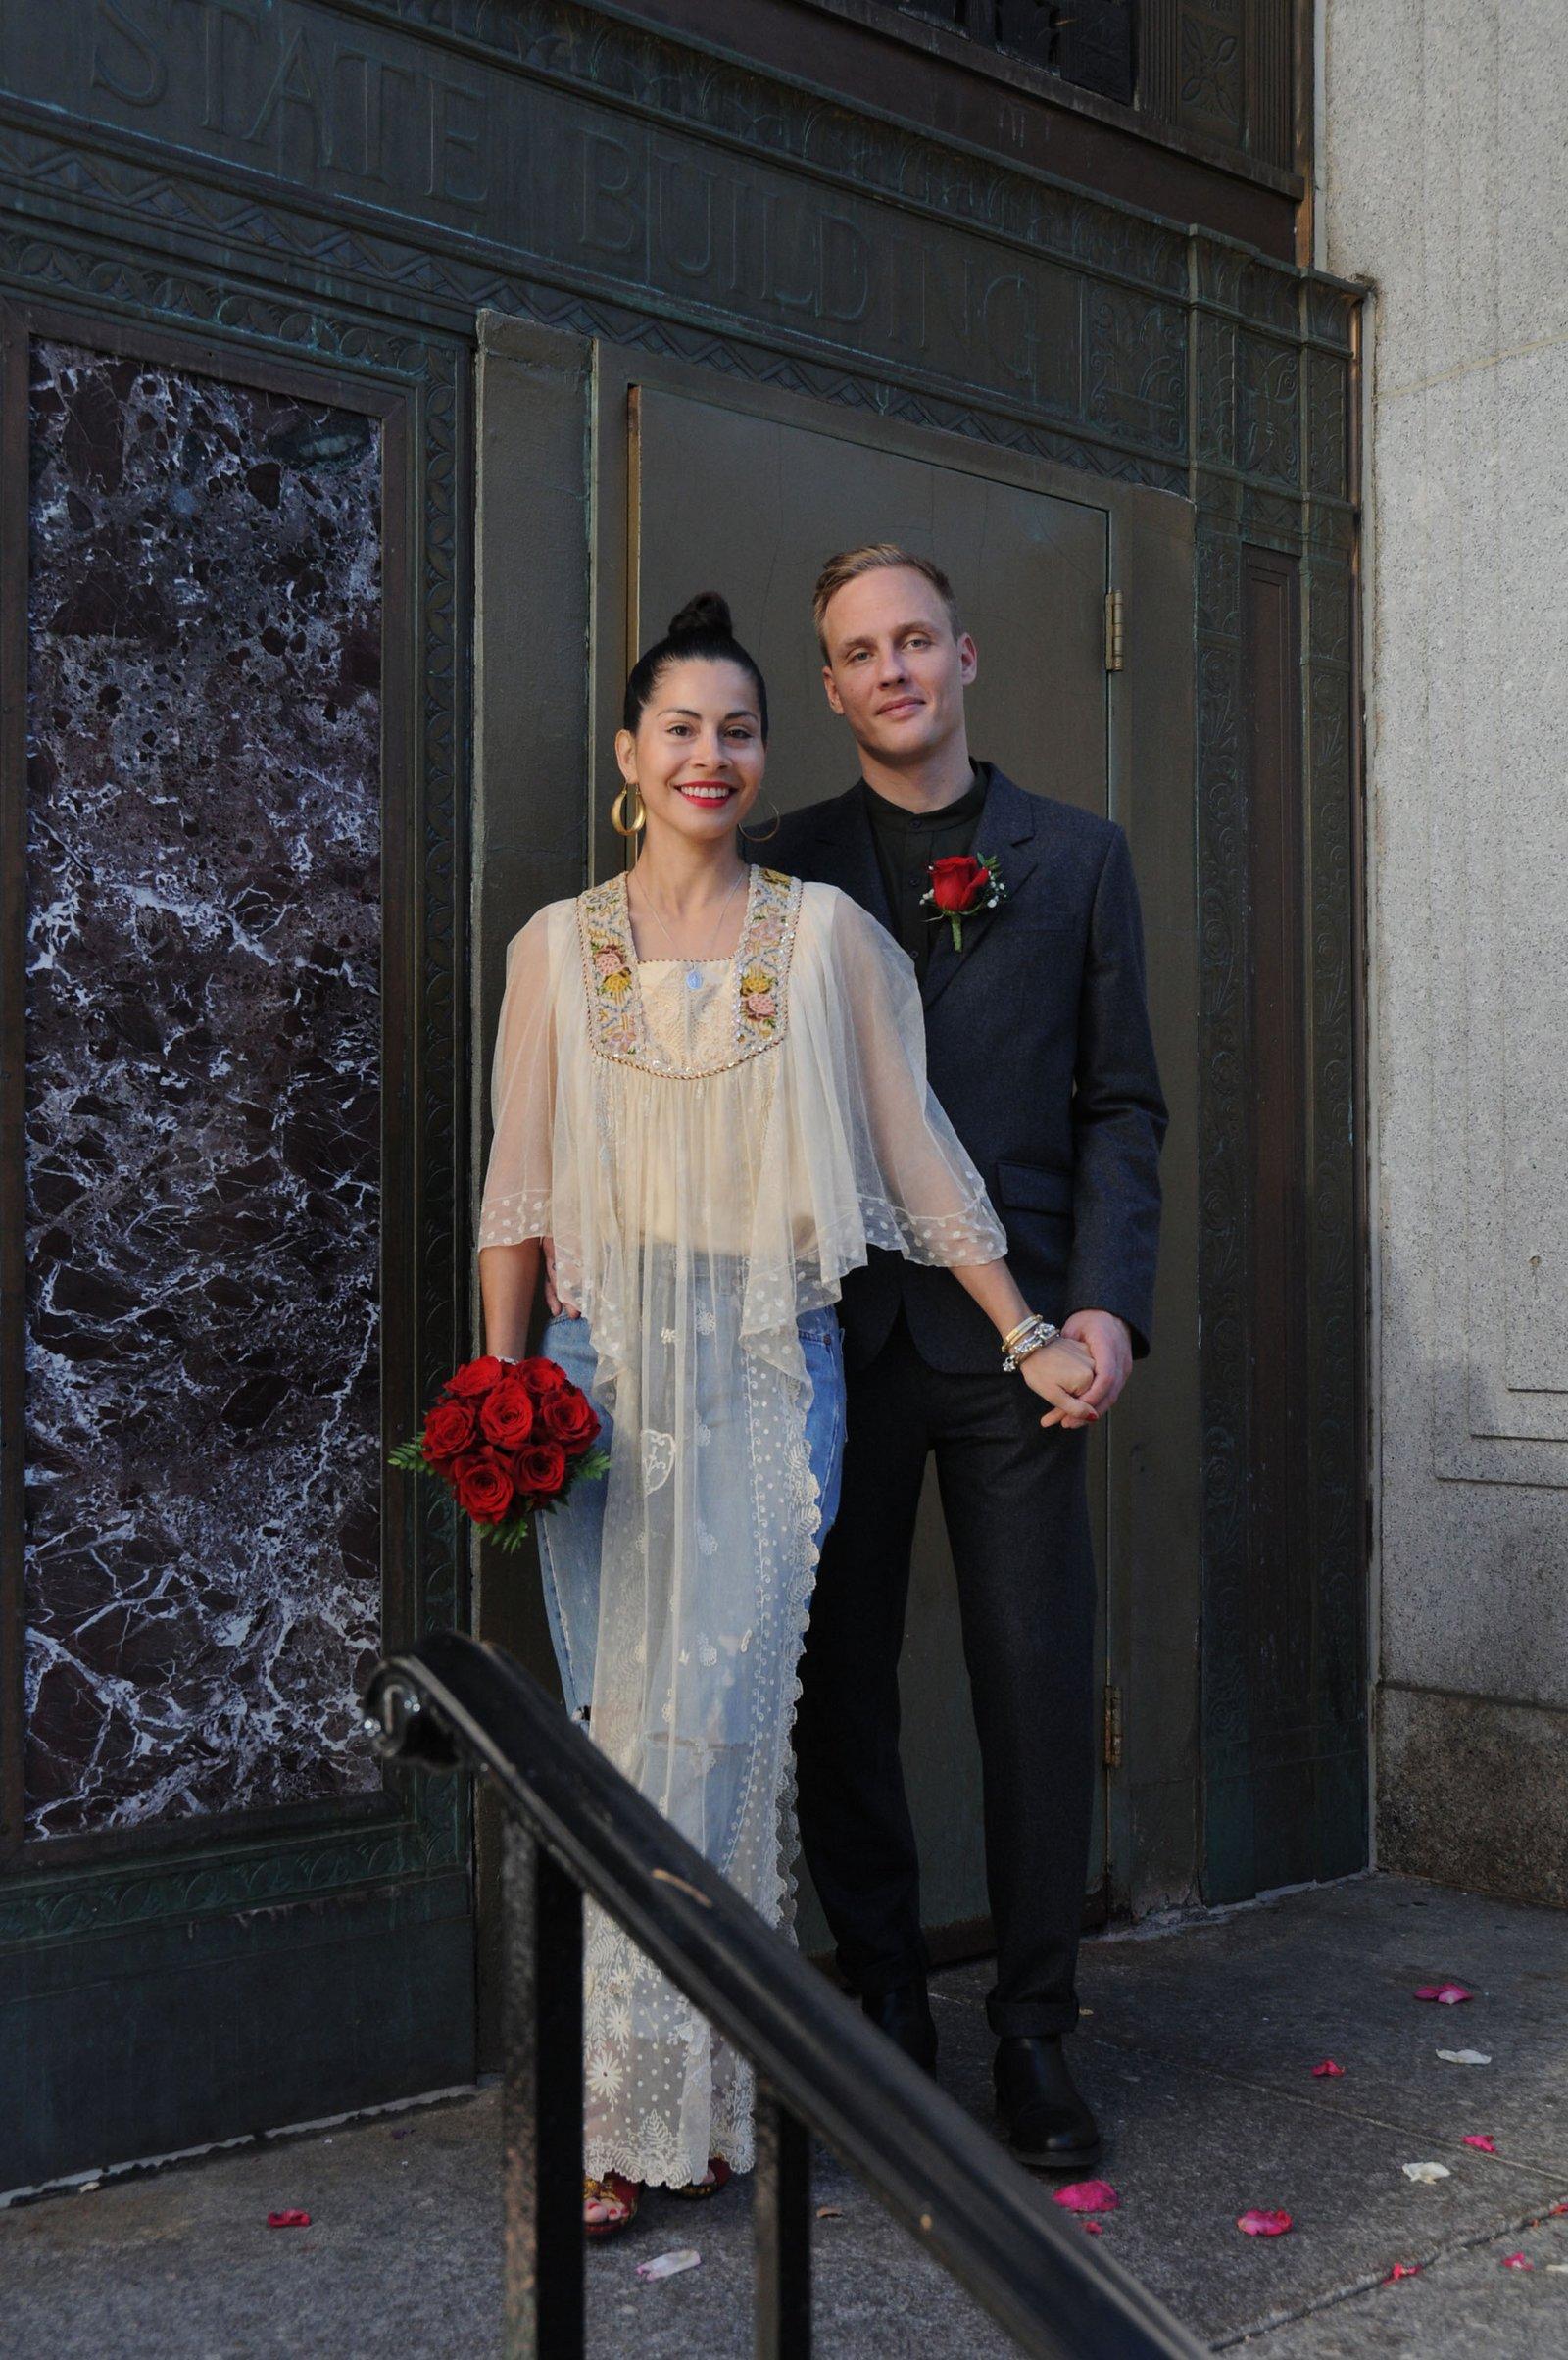 01 bride wearing denim